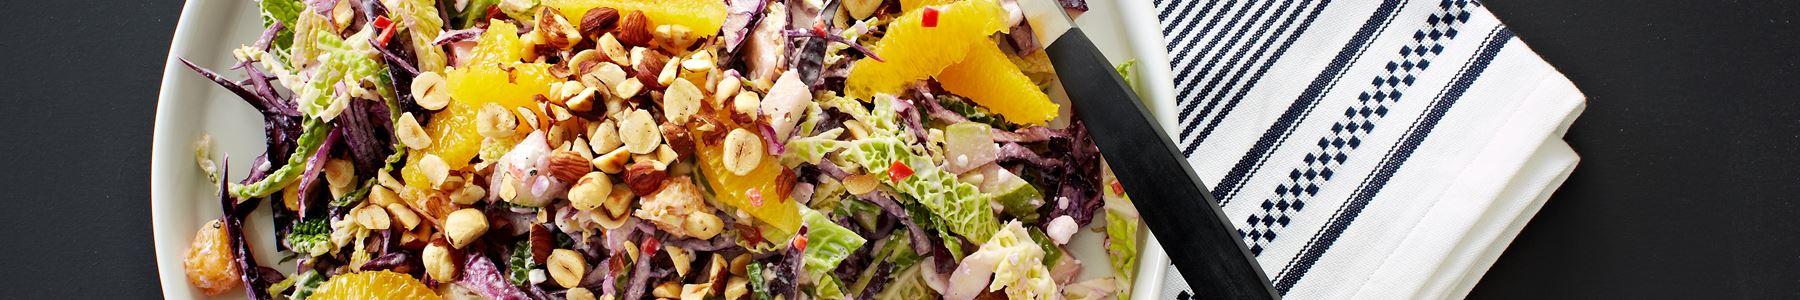 Pære + Salater + Efterår